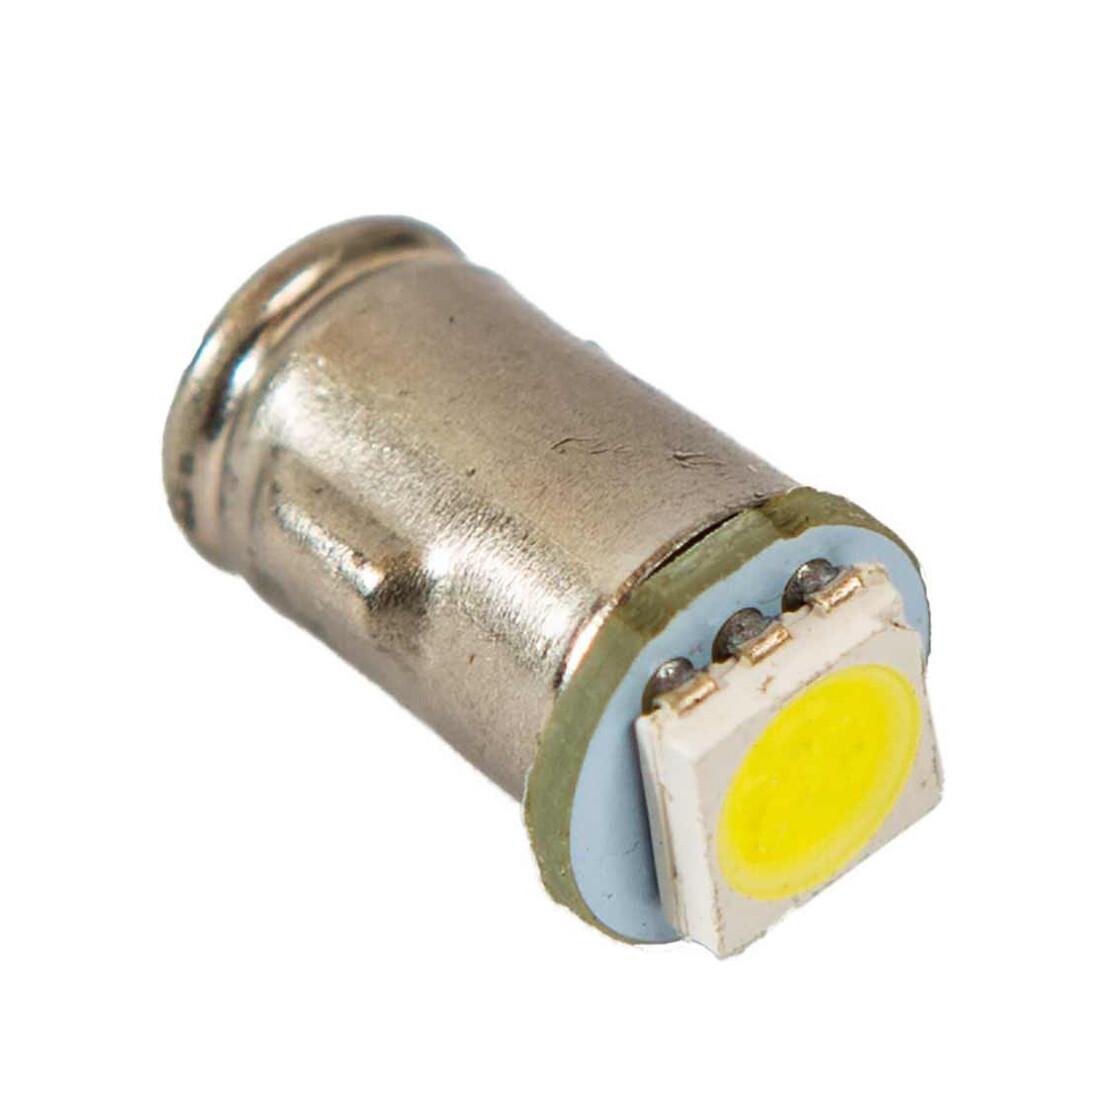 Armaturen Beleuchtung   T1 Led Leuchtmittel Instrumentenbeleuchtung Armaturenbeleuchtung 6 V